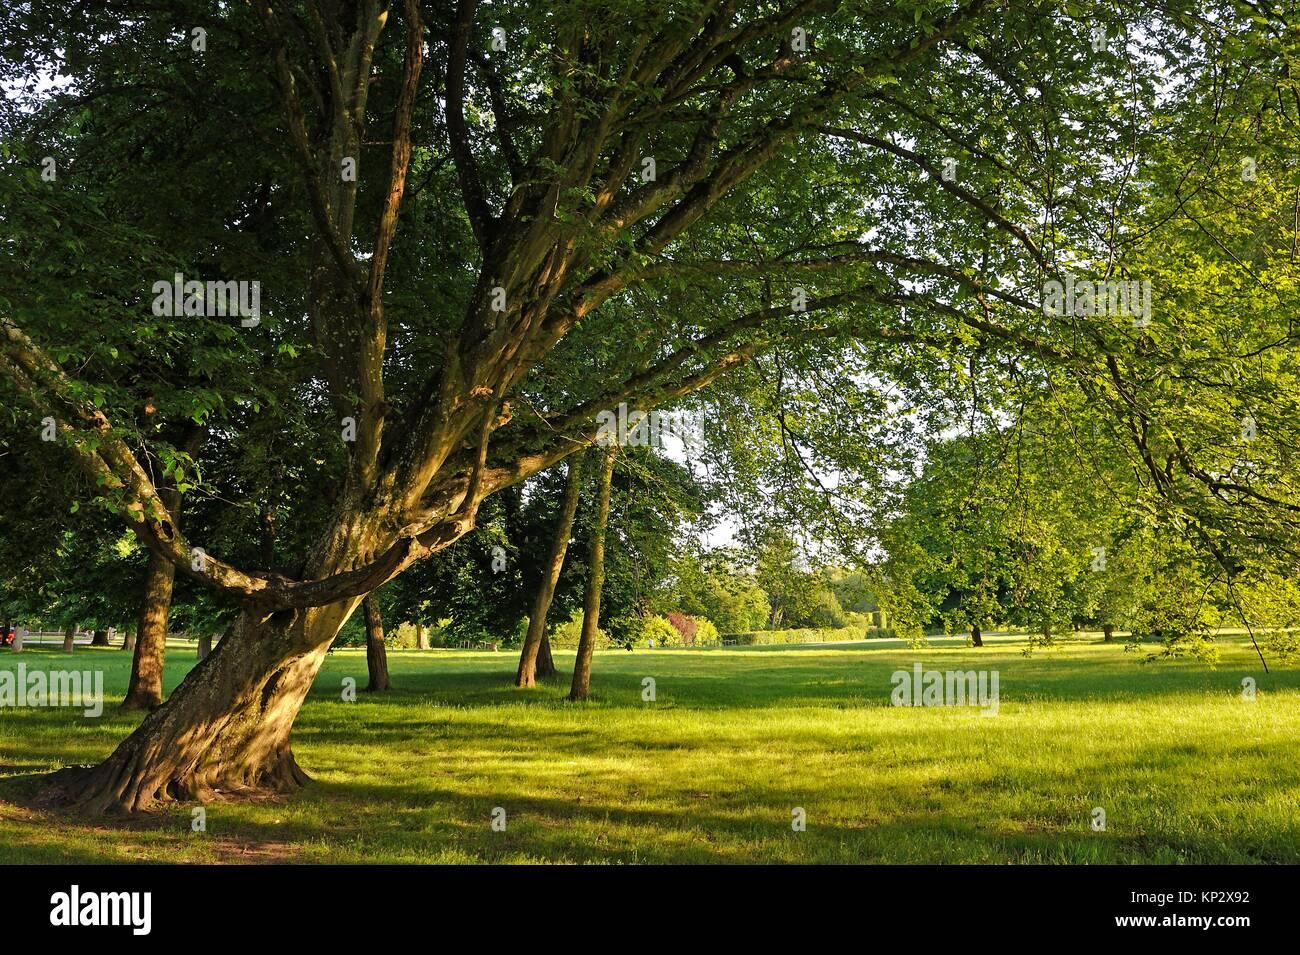 park of the Chateau de Rambouillet, Department of Yvelines, Ile-de-France region, France, Europe. - Stock Image